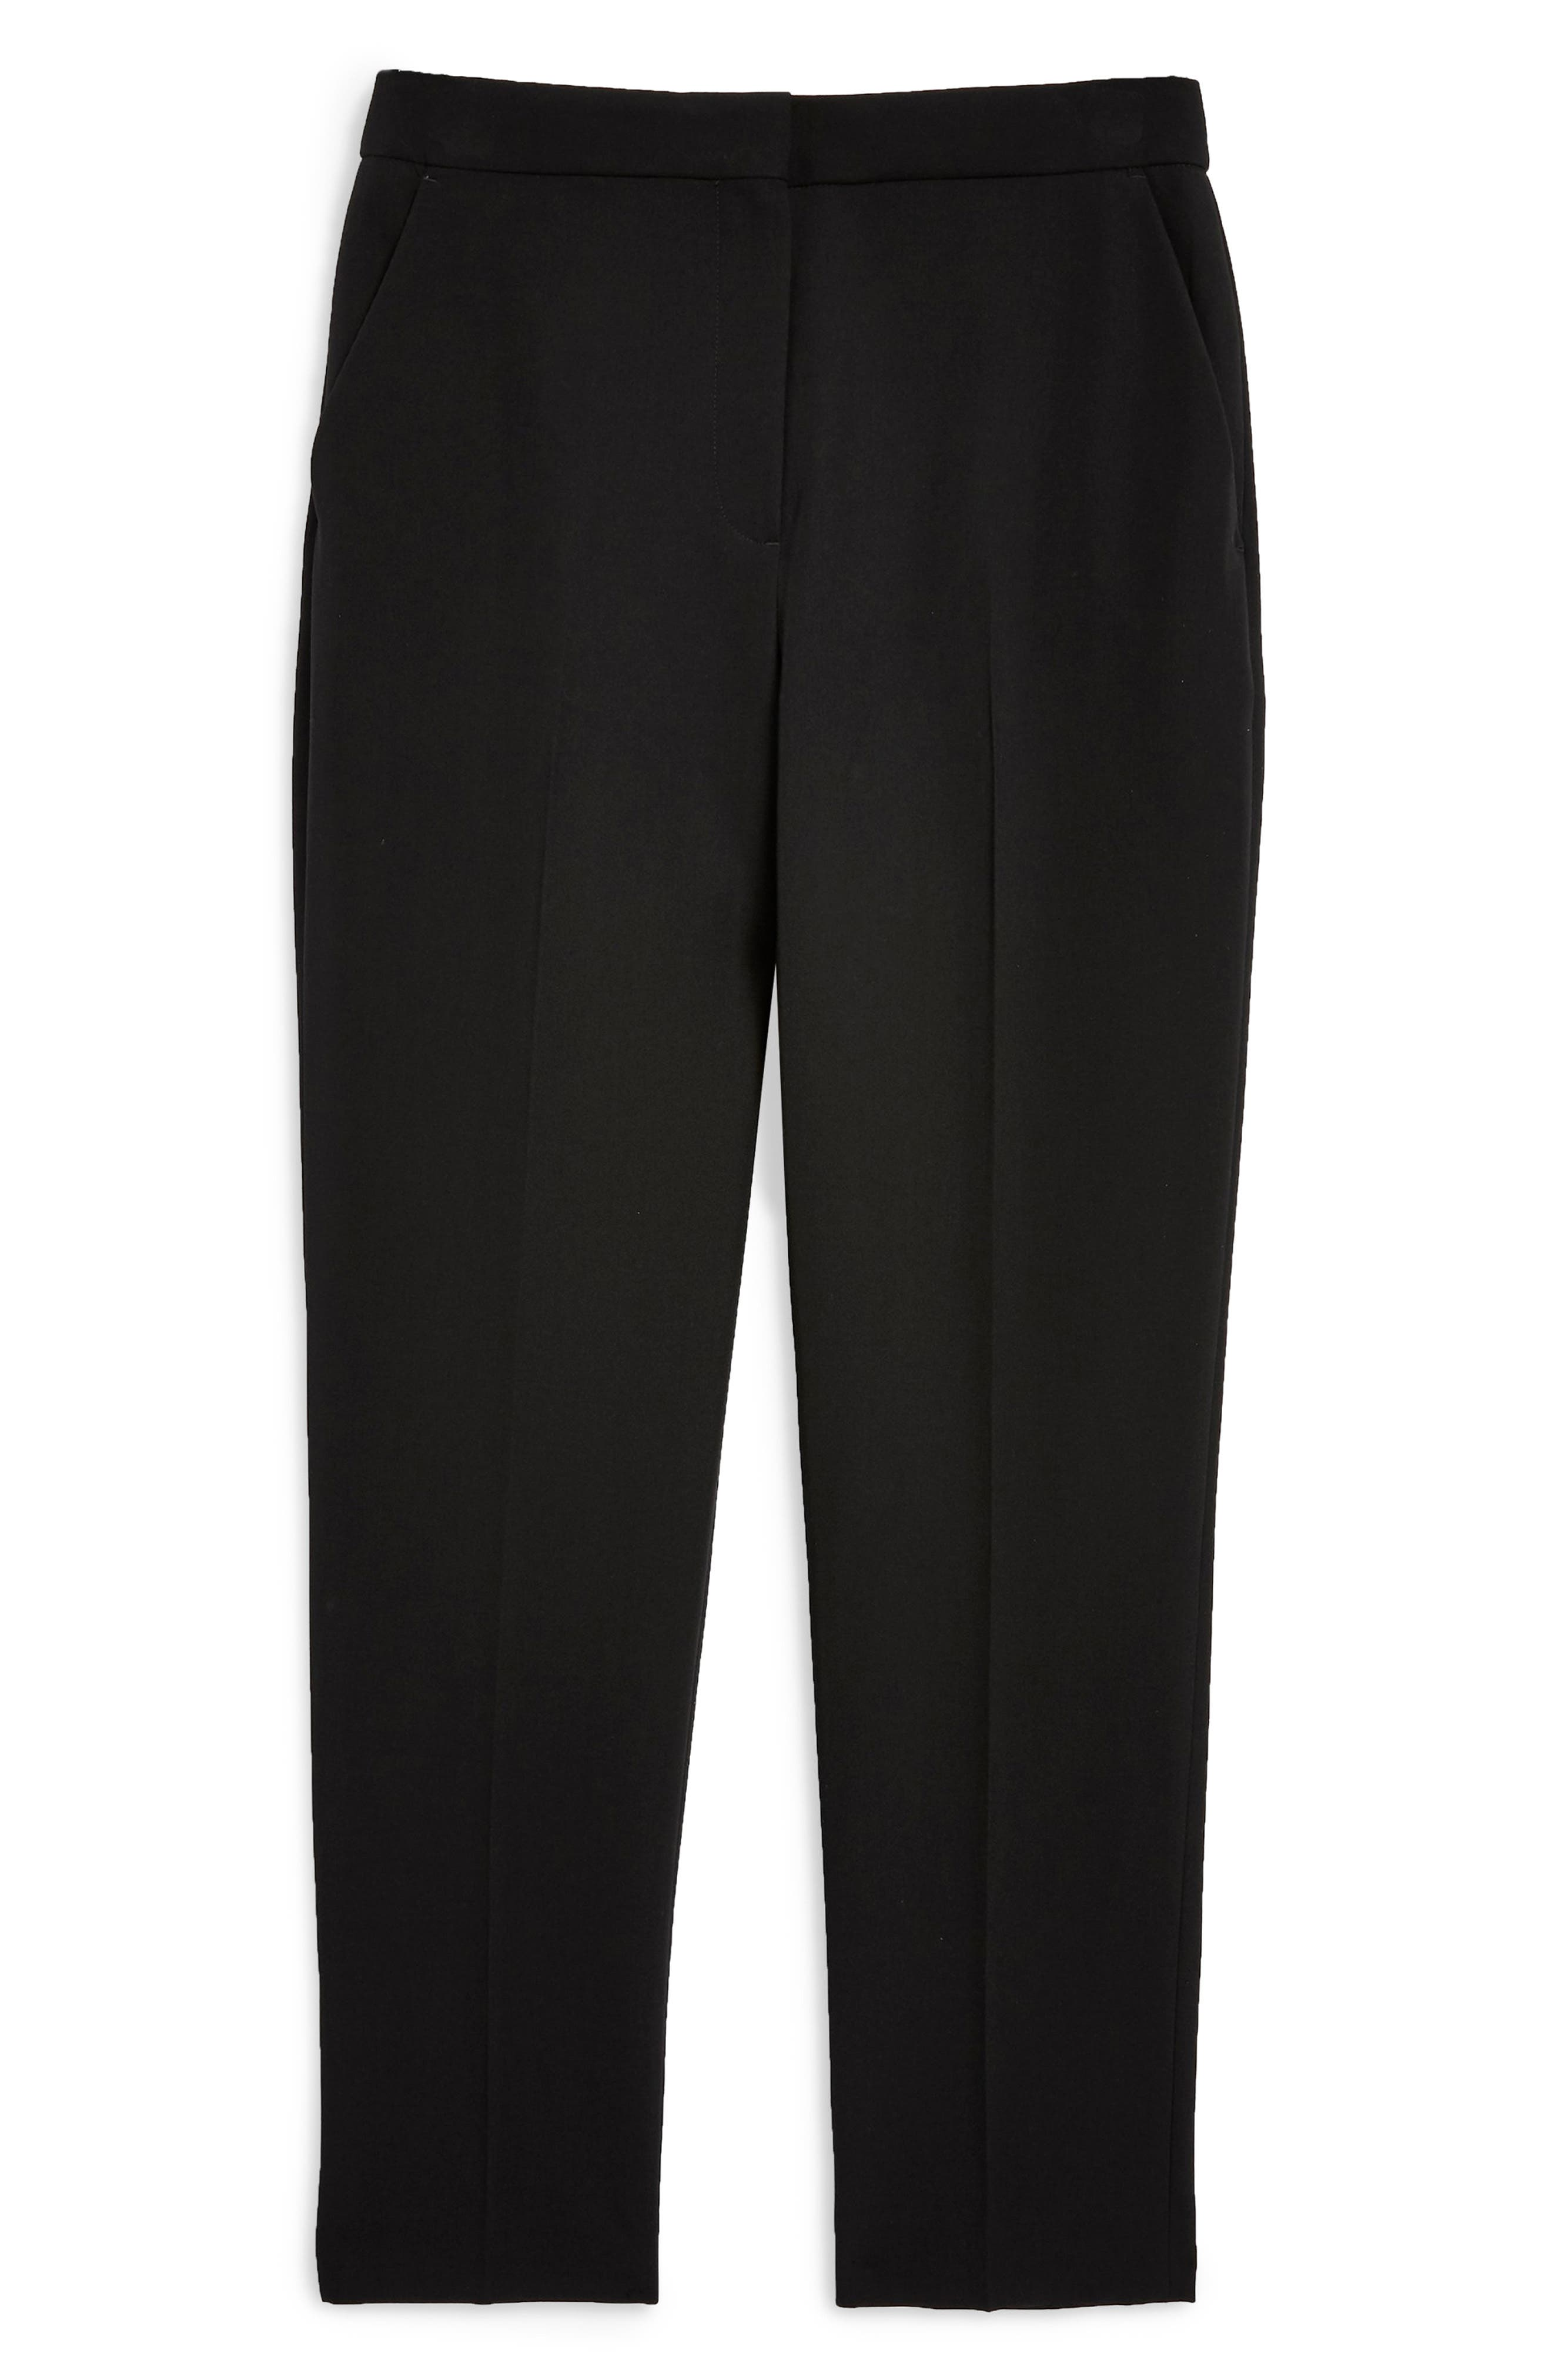 TOPSHOP,                             Kleo Cigarette Trousers,                             Alternate thumbnail 4, color,                             BLACK